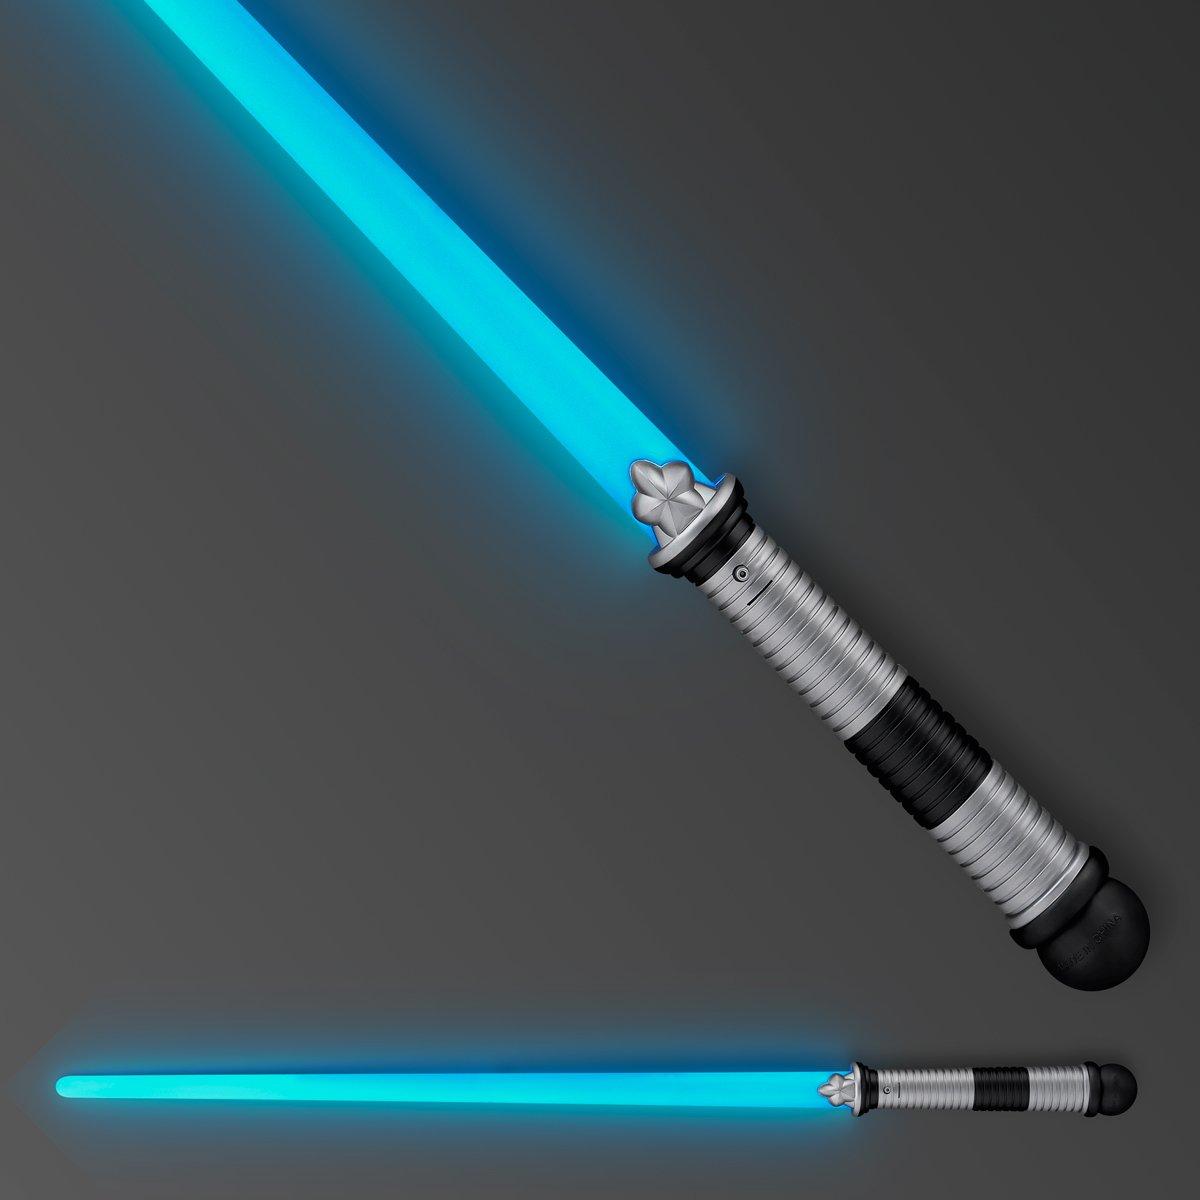 Blue LED Light Up Saber Space Weapon FlashingBlinkyLights